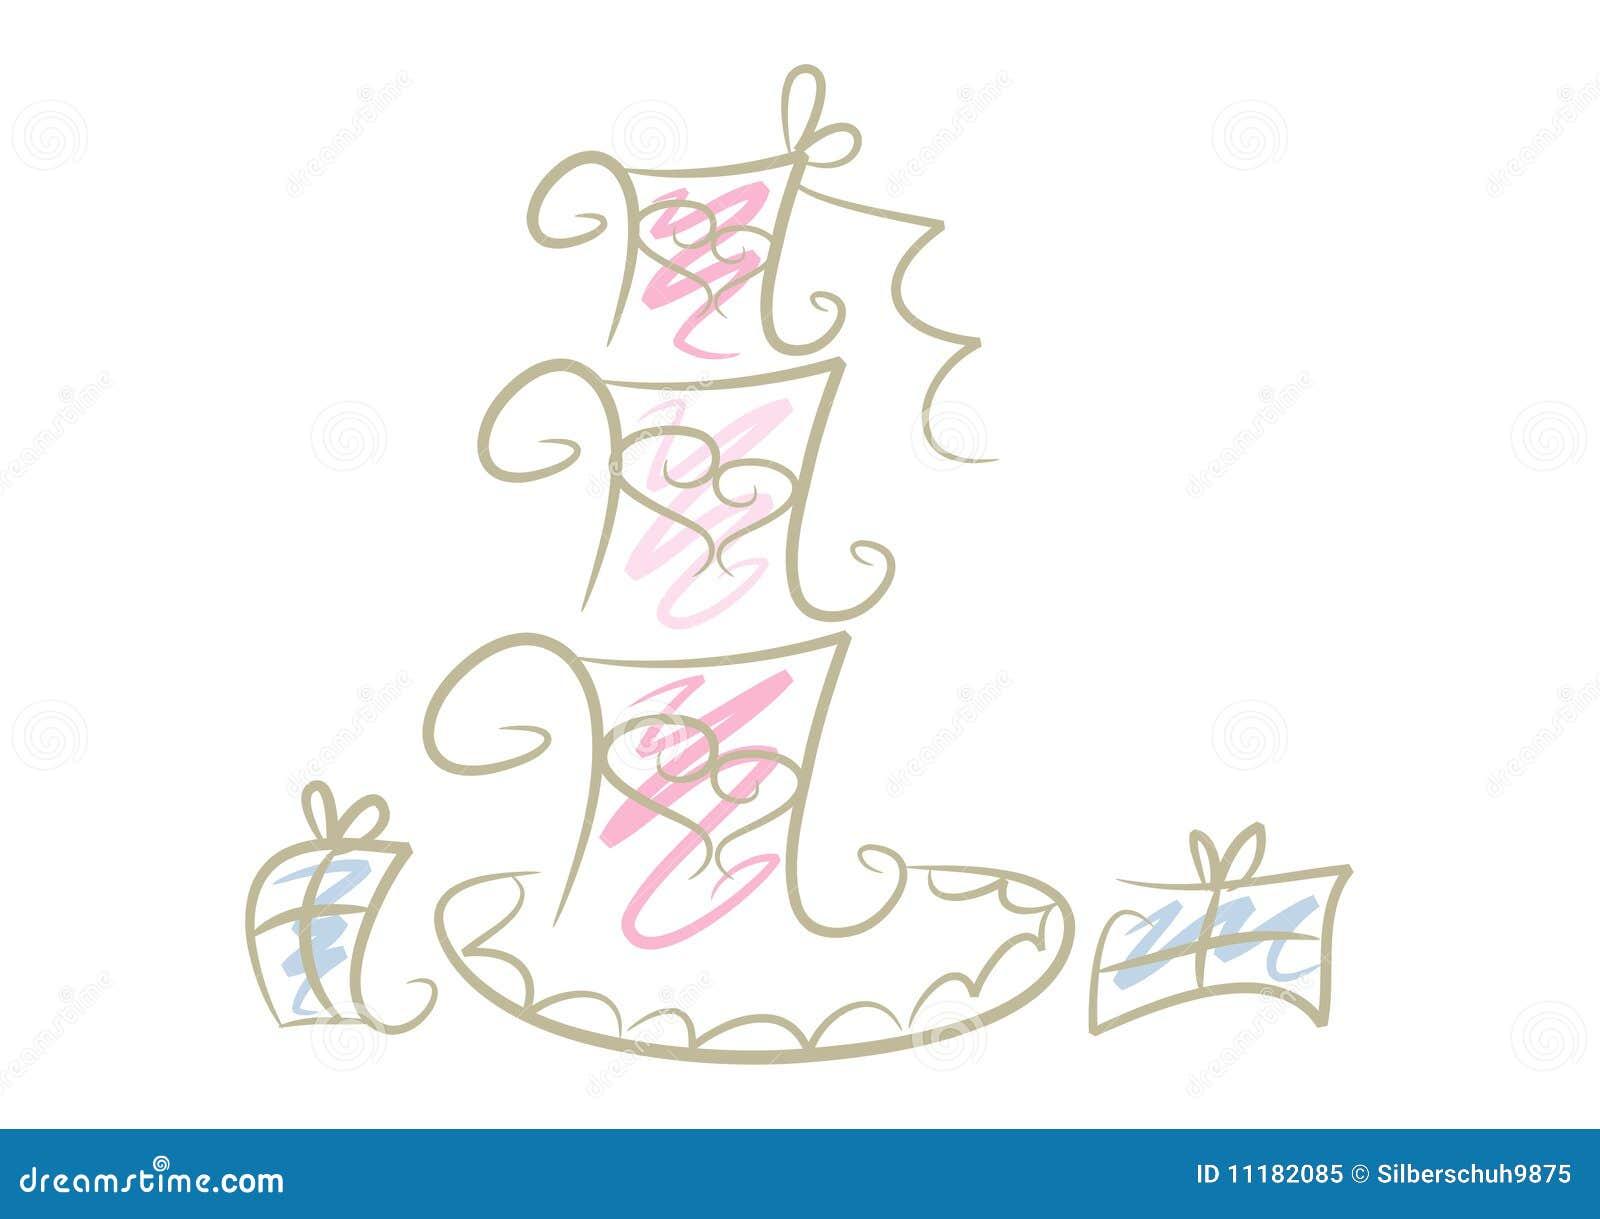 Simple Wedding Cake Drawing